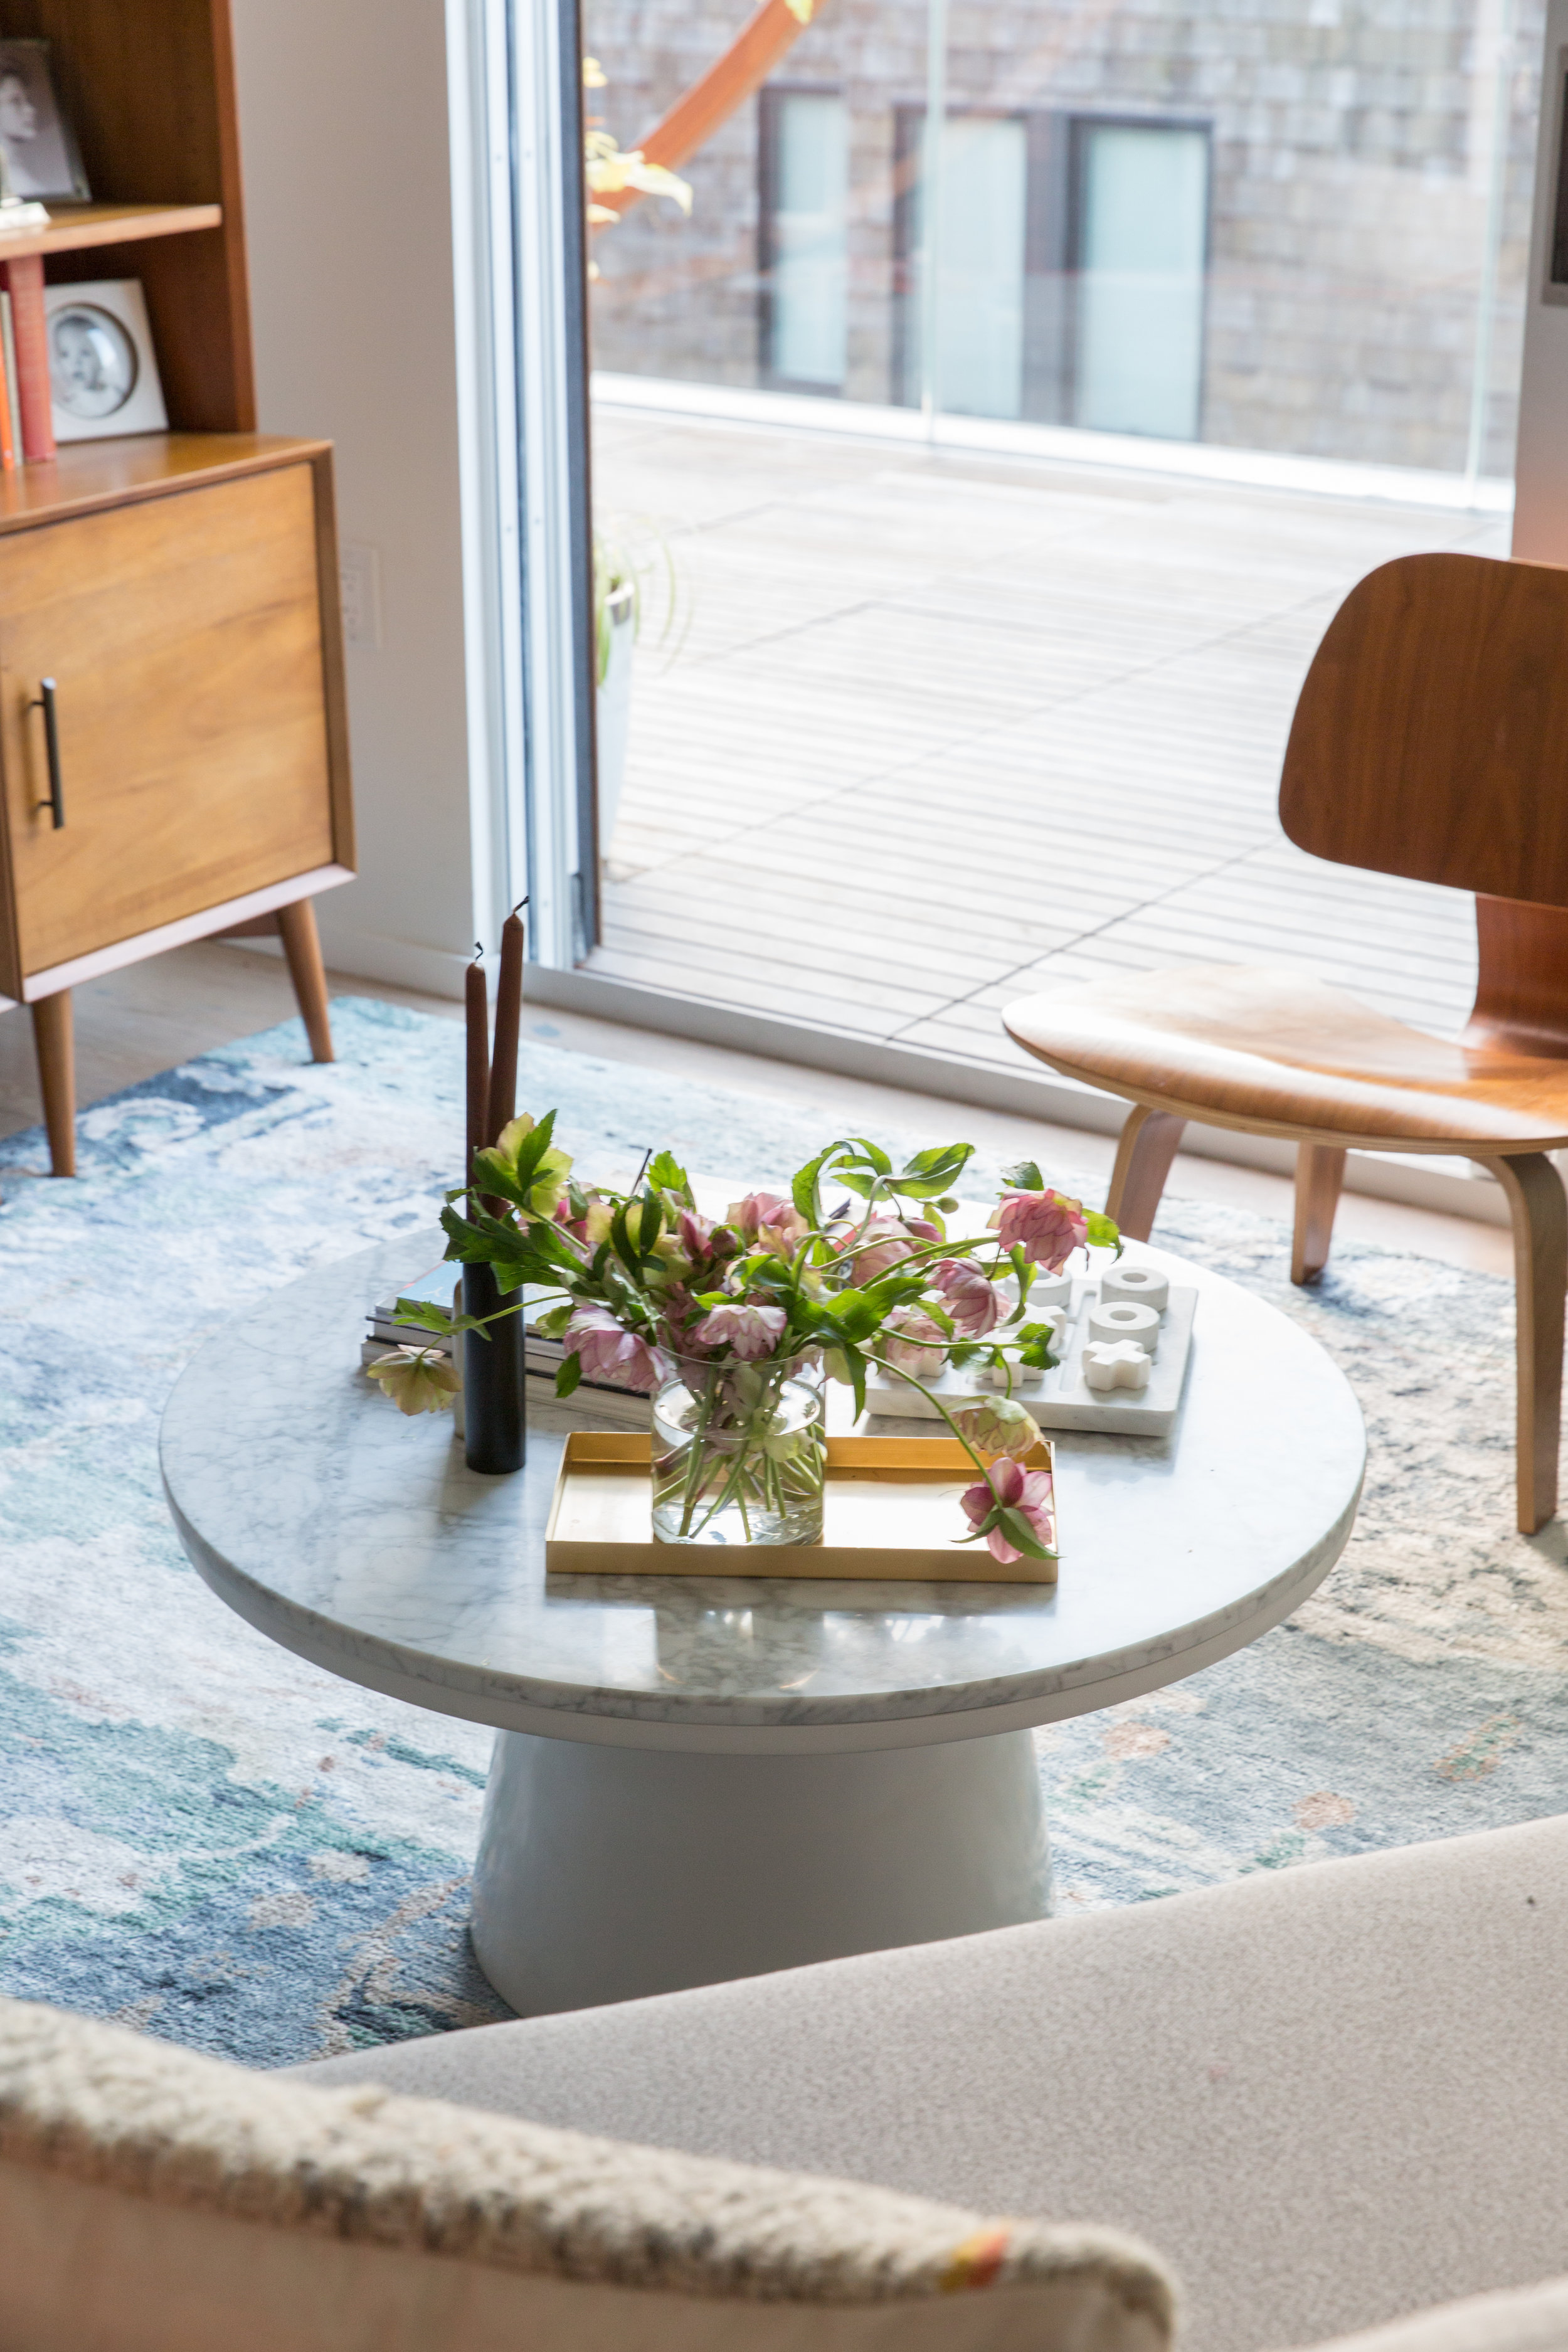 13 RBD Hayes Valley Hip Haven - Living Room Coffee Table Vignette.jpg